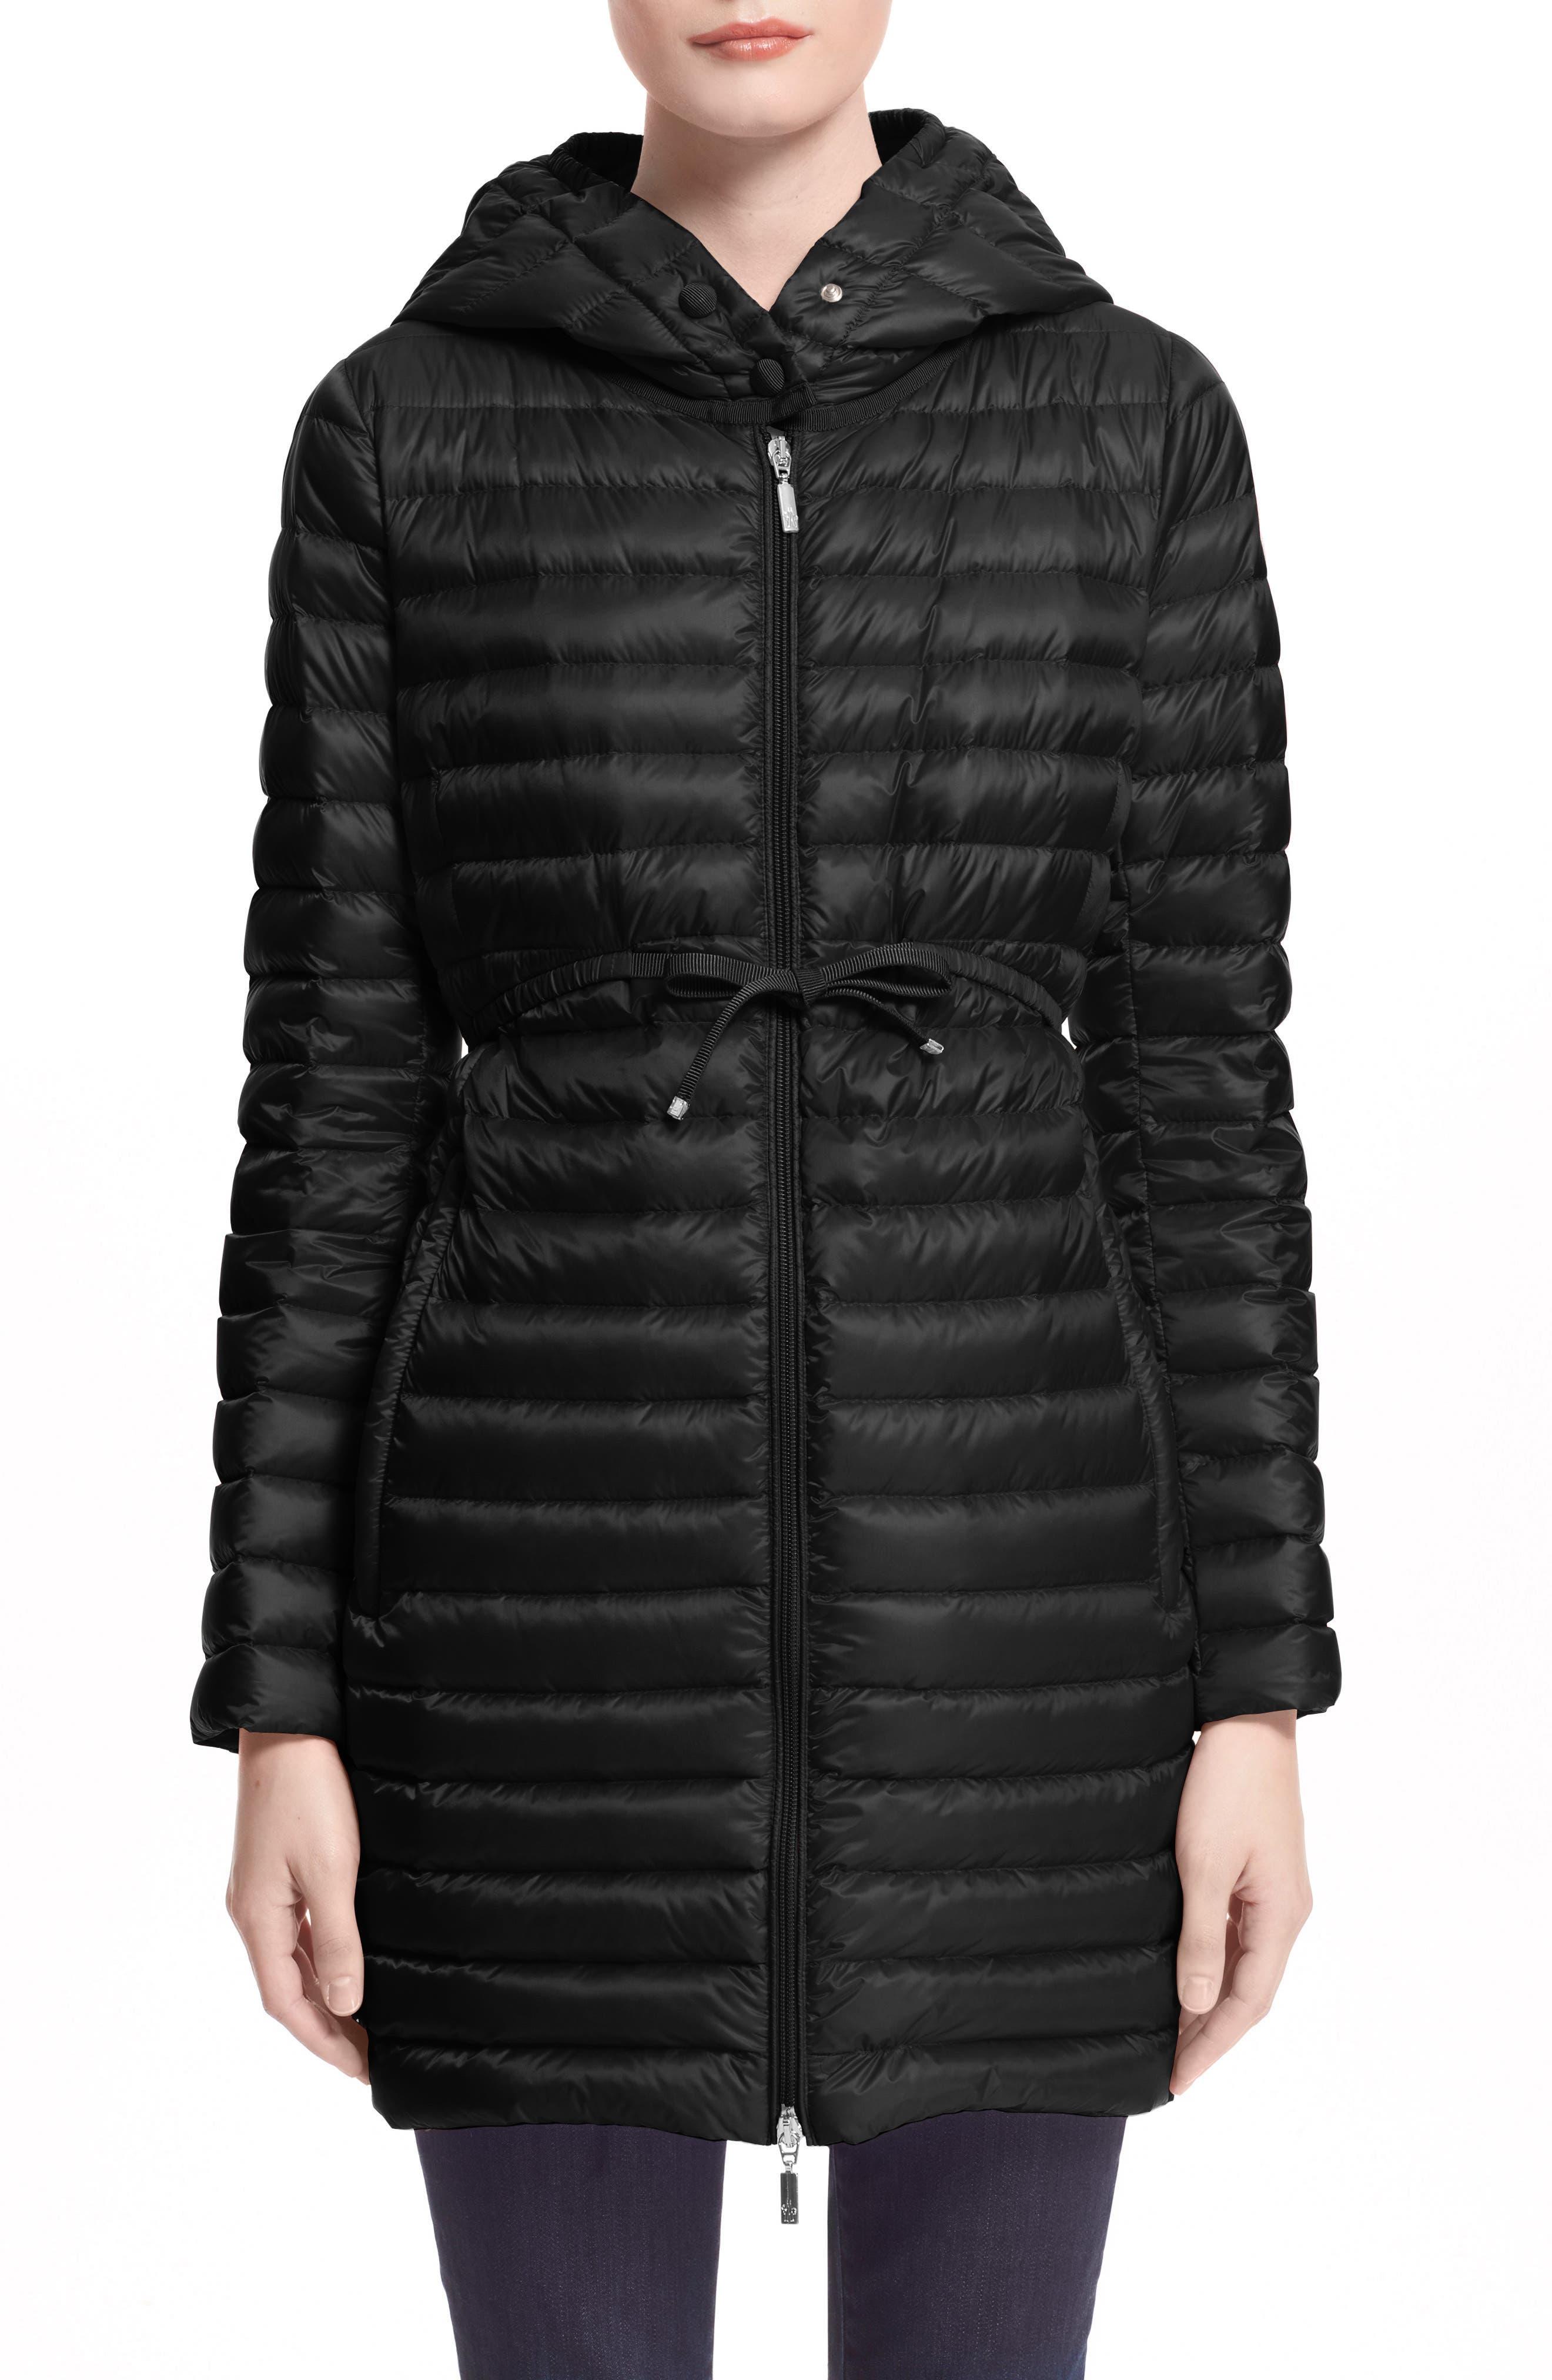 Alternate Image 1 Selected - Moncler Barbel Water Resistant Long Hooded Down Jacket